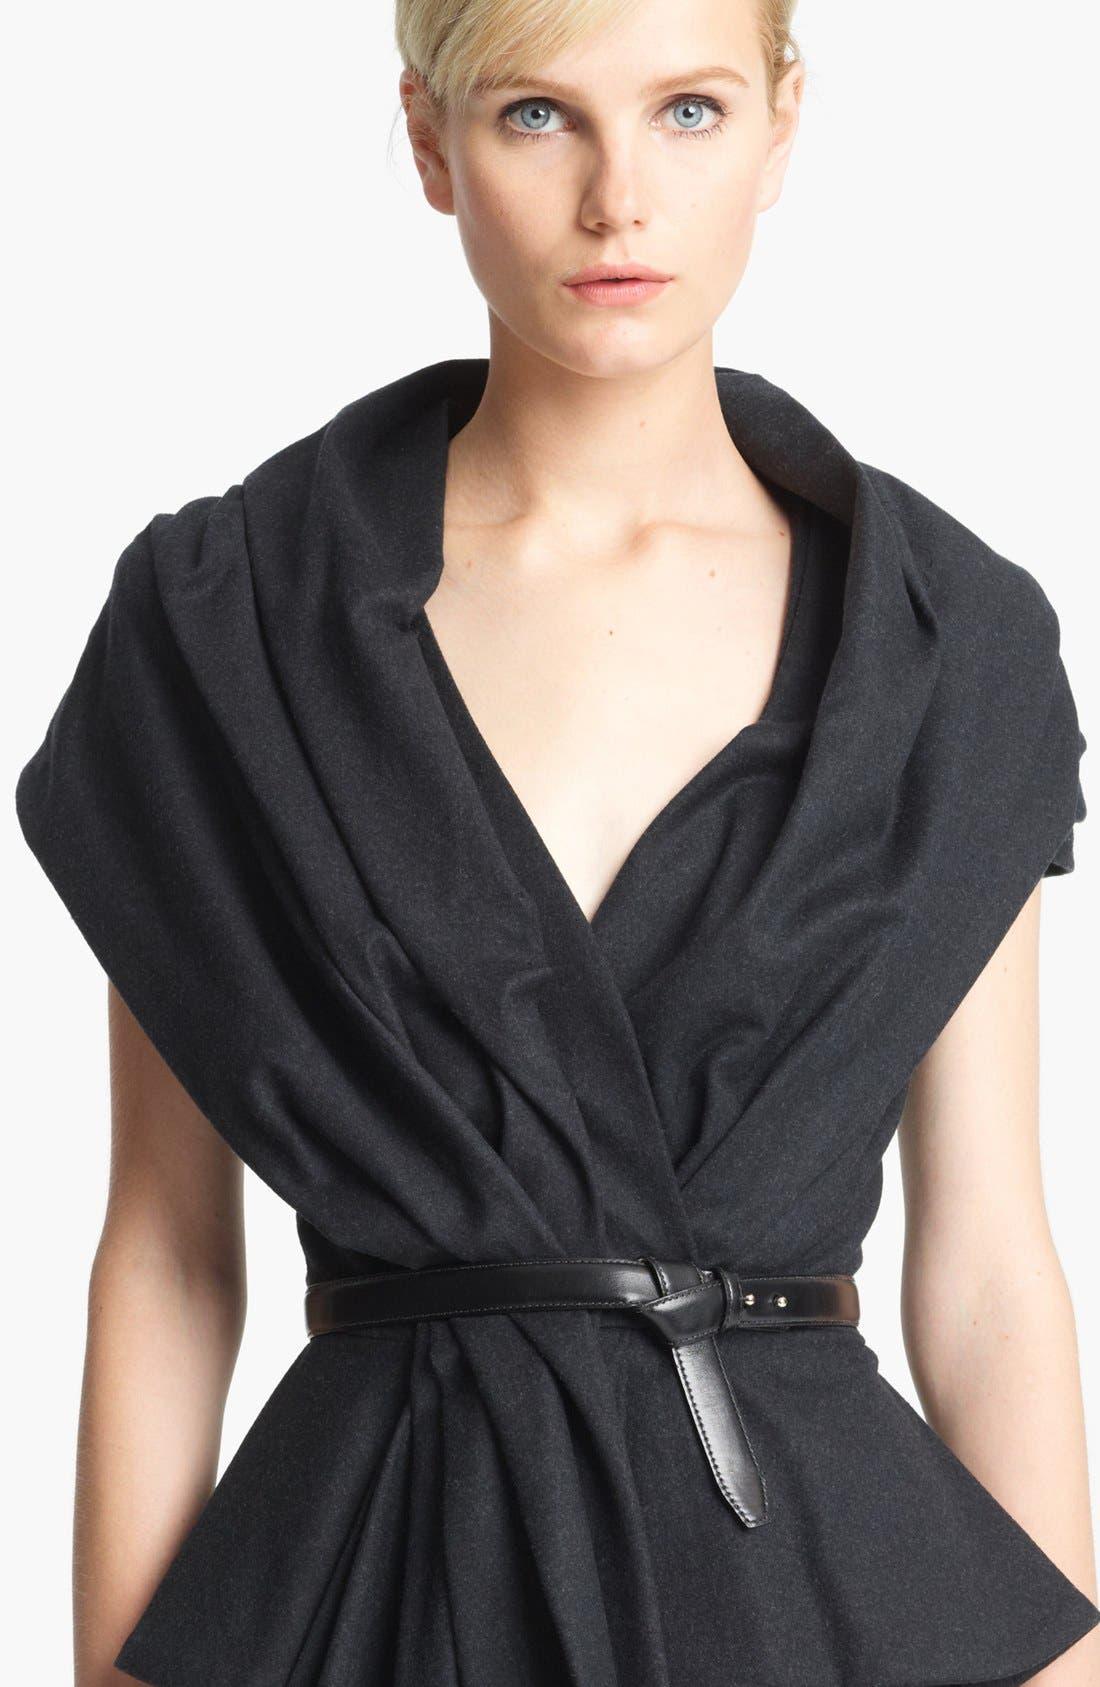 Main Image - Oscar de la Renta Tie Front Leather Belt